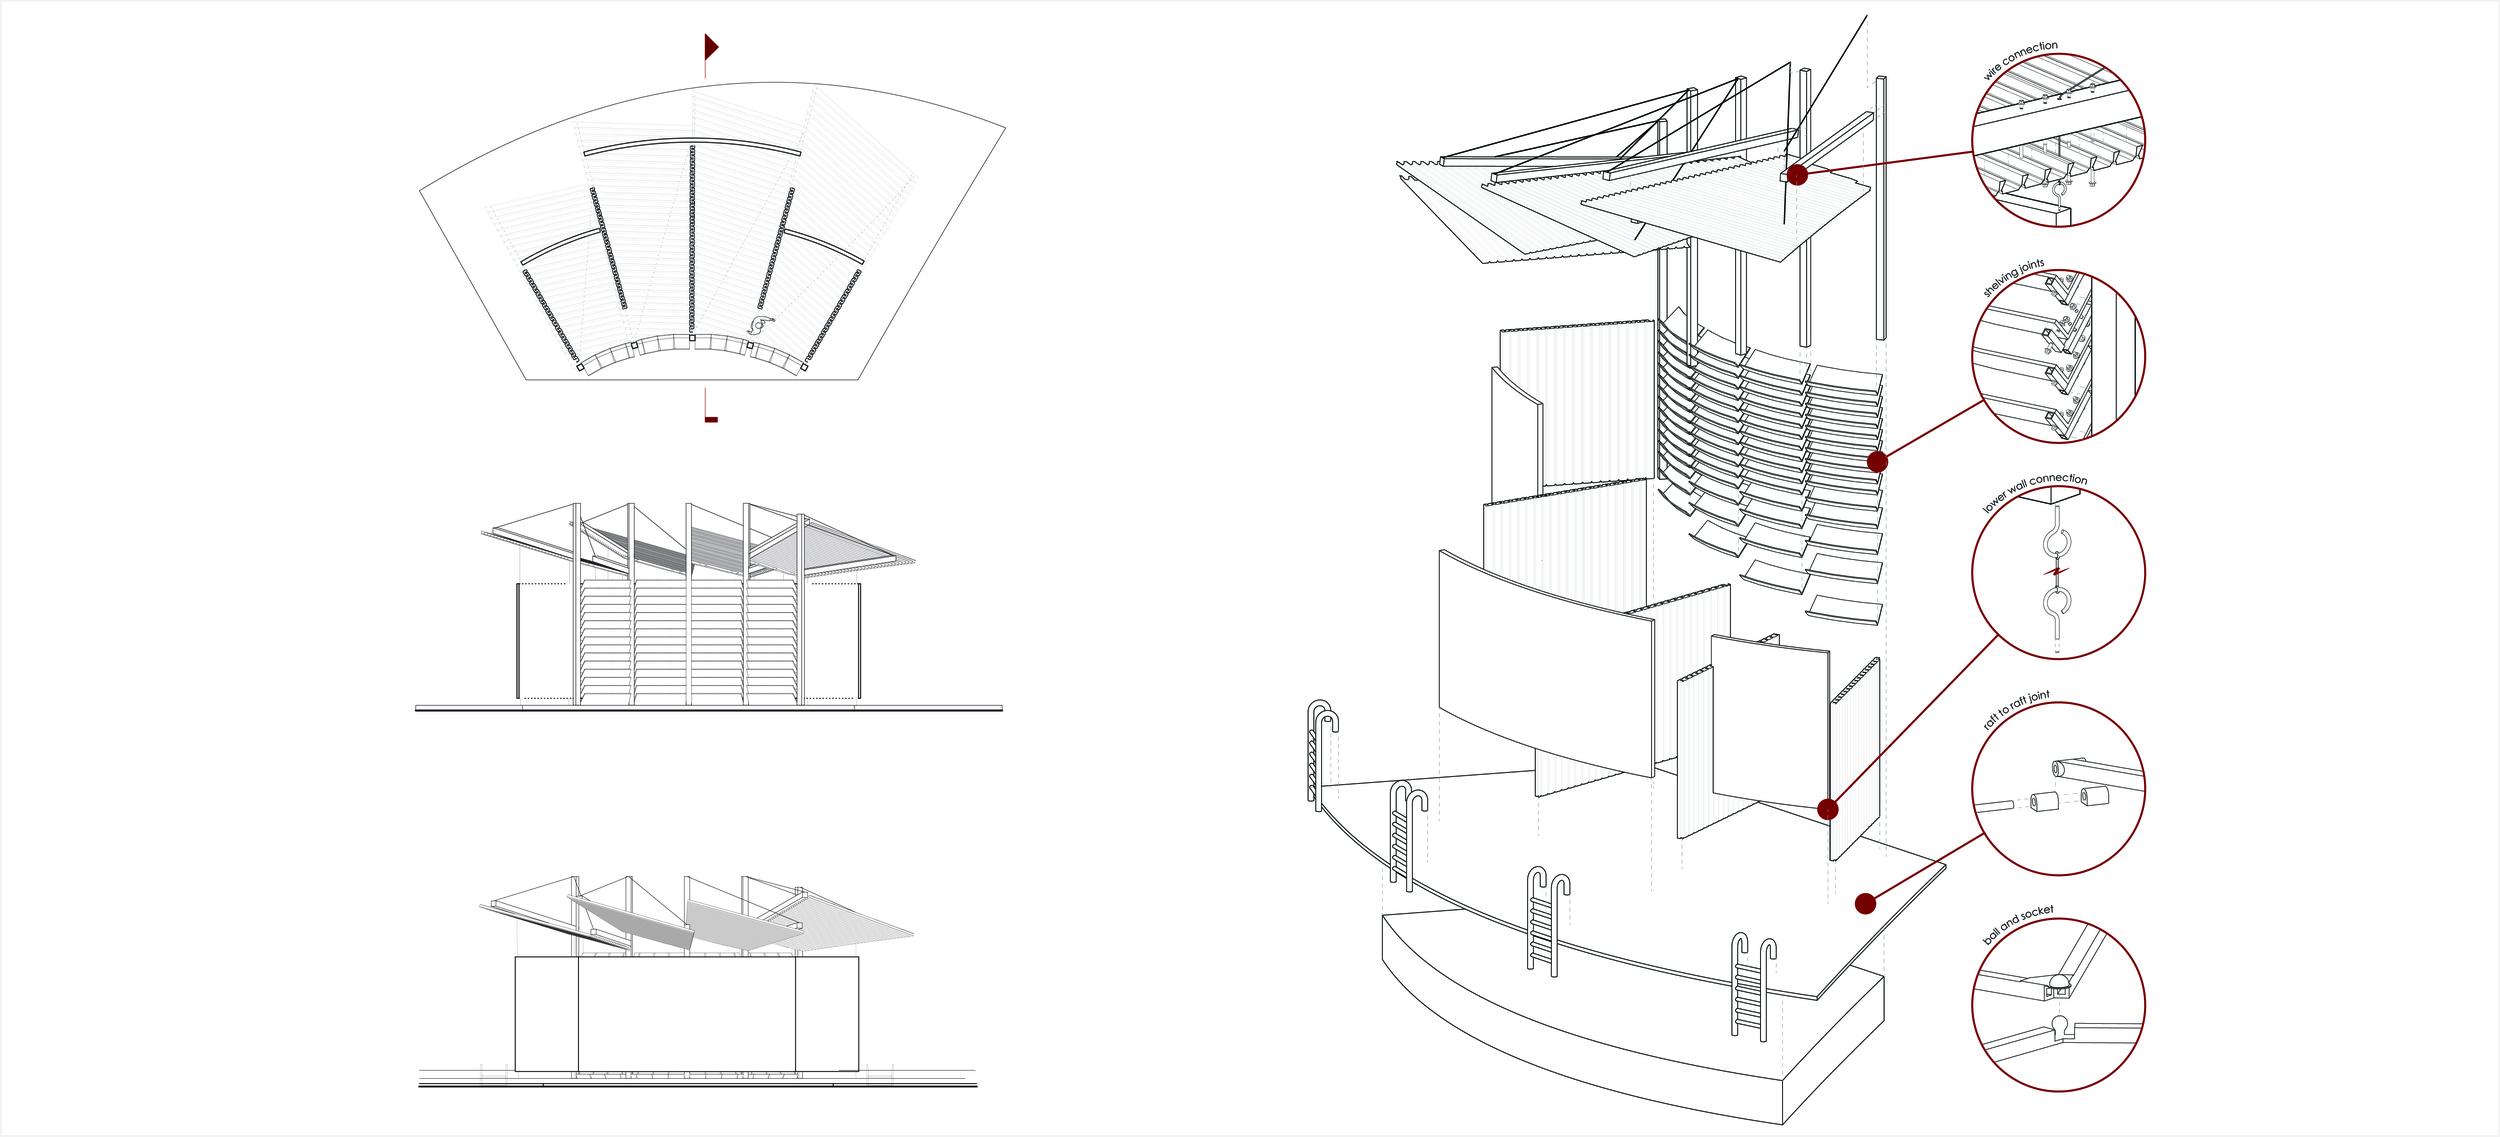 Plan + Elevations + Details.jpg